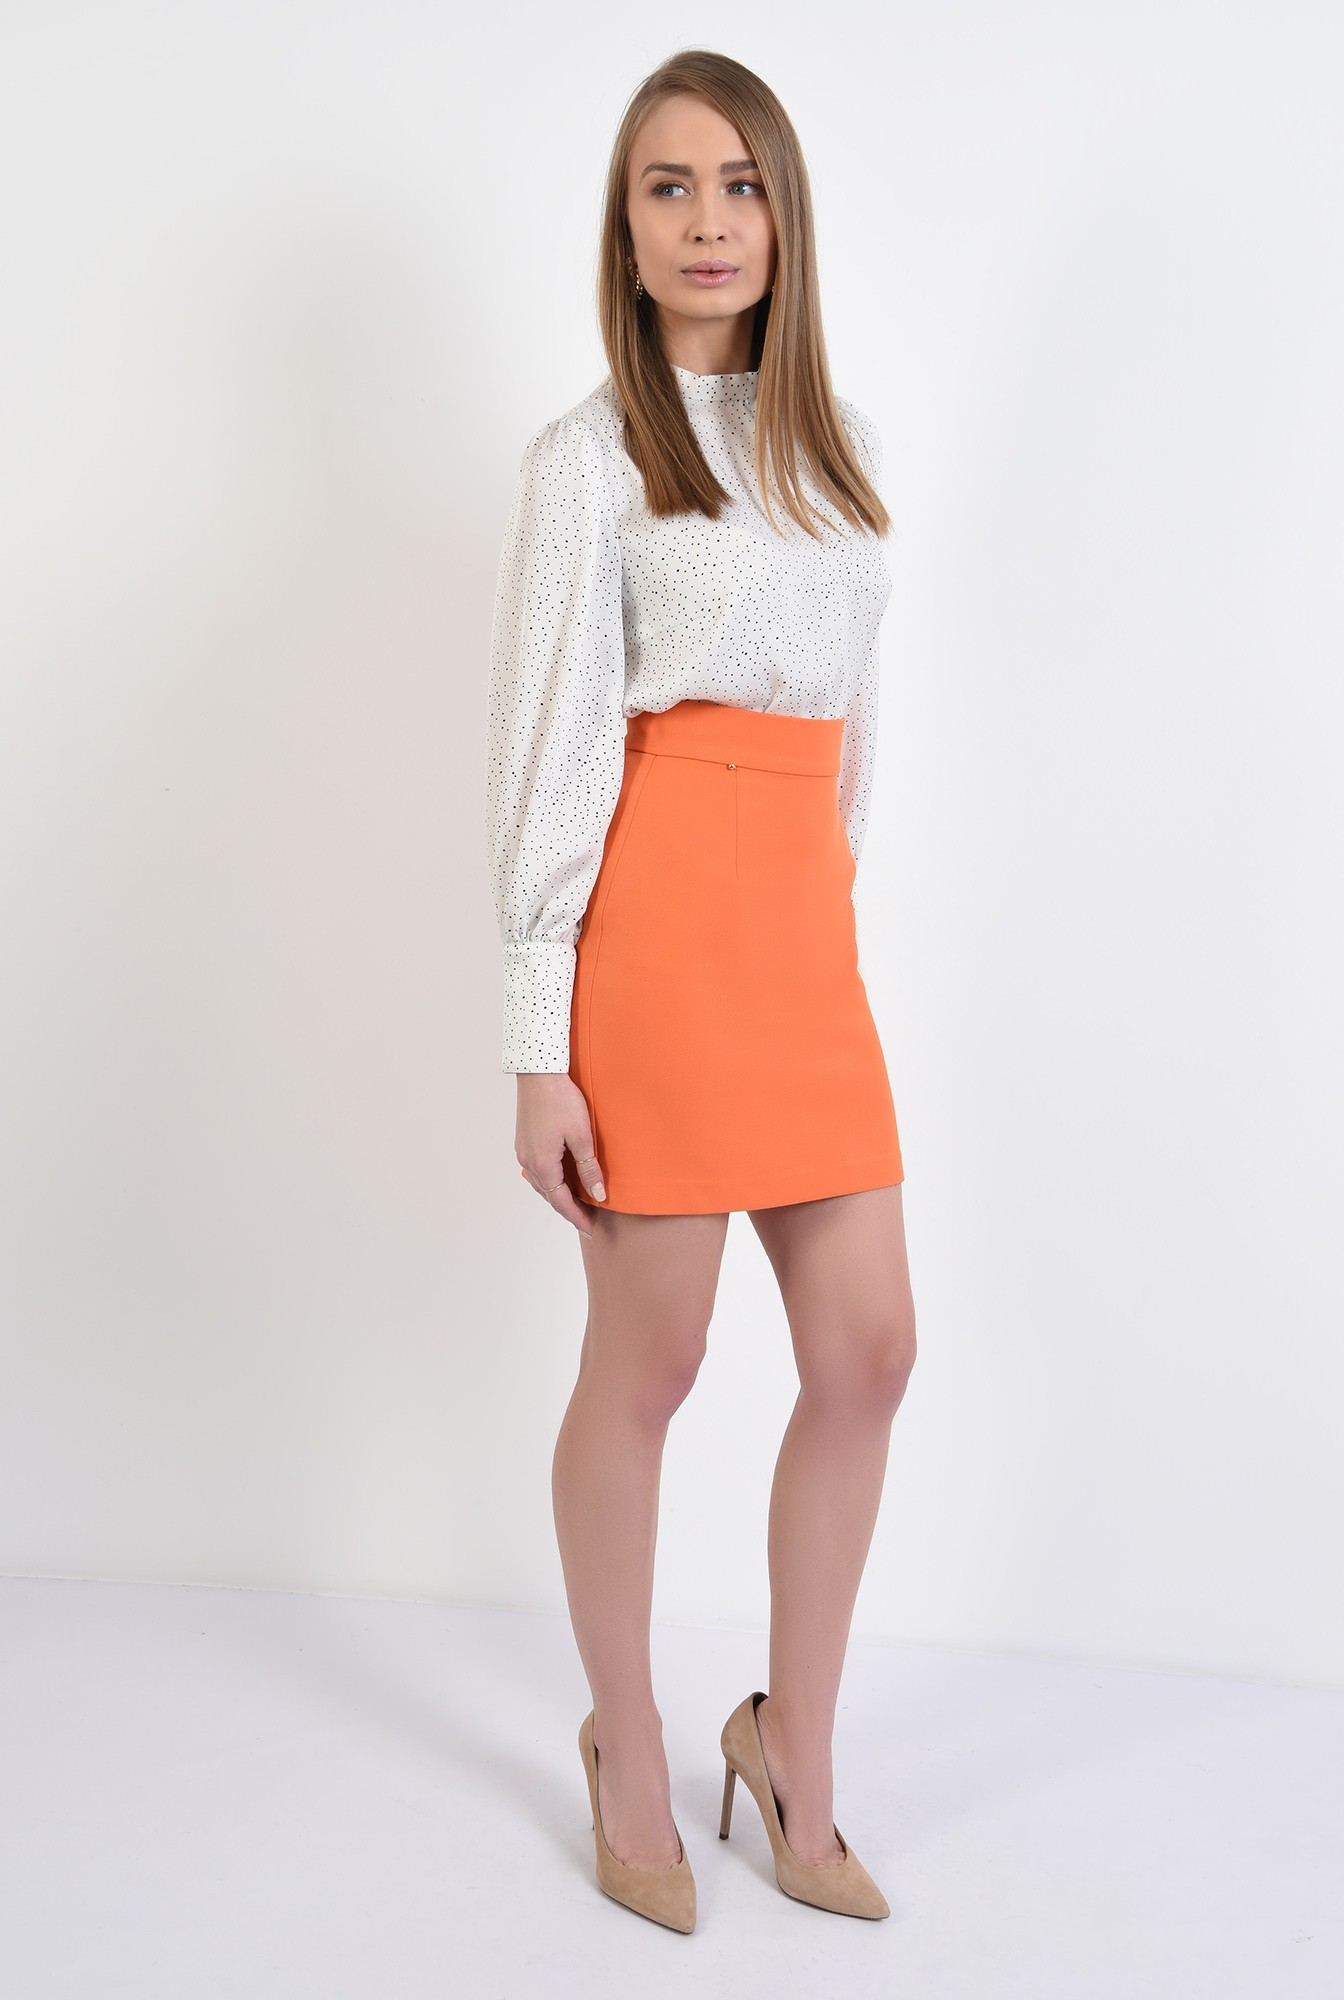 3 -  fusta orange, mini, dreapta, cu talie inalta, fermoar ascuns